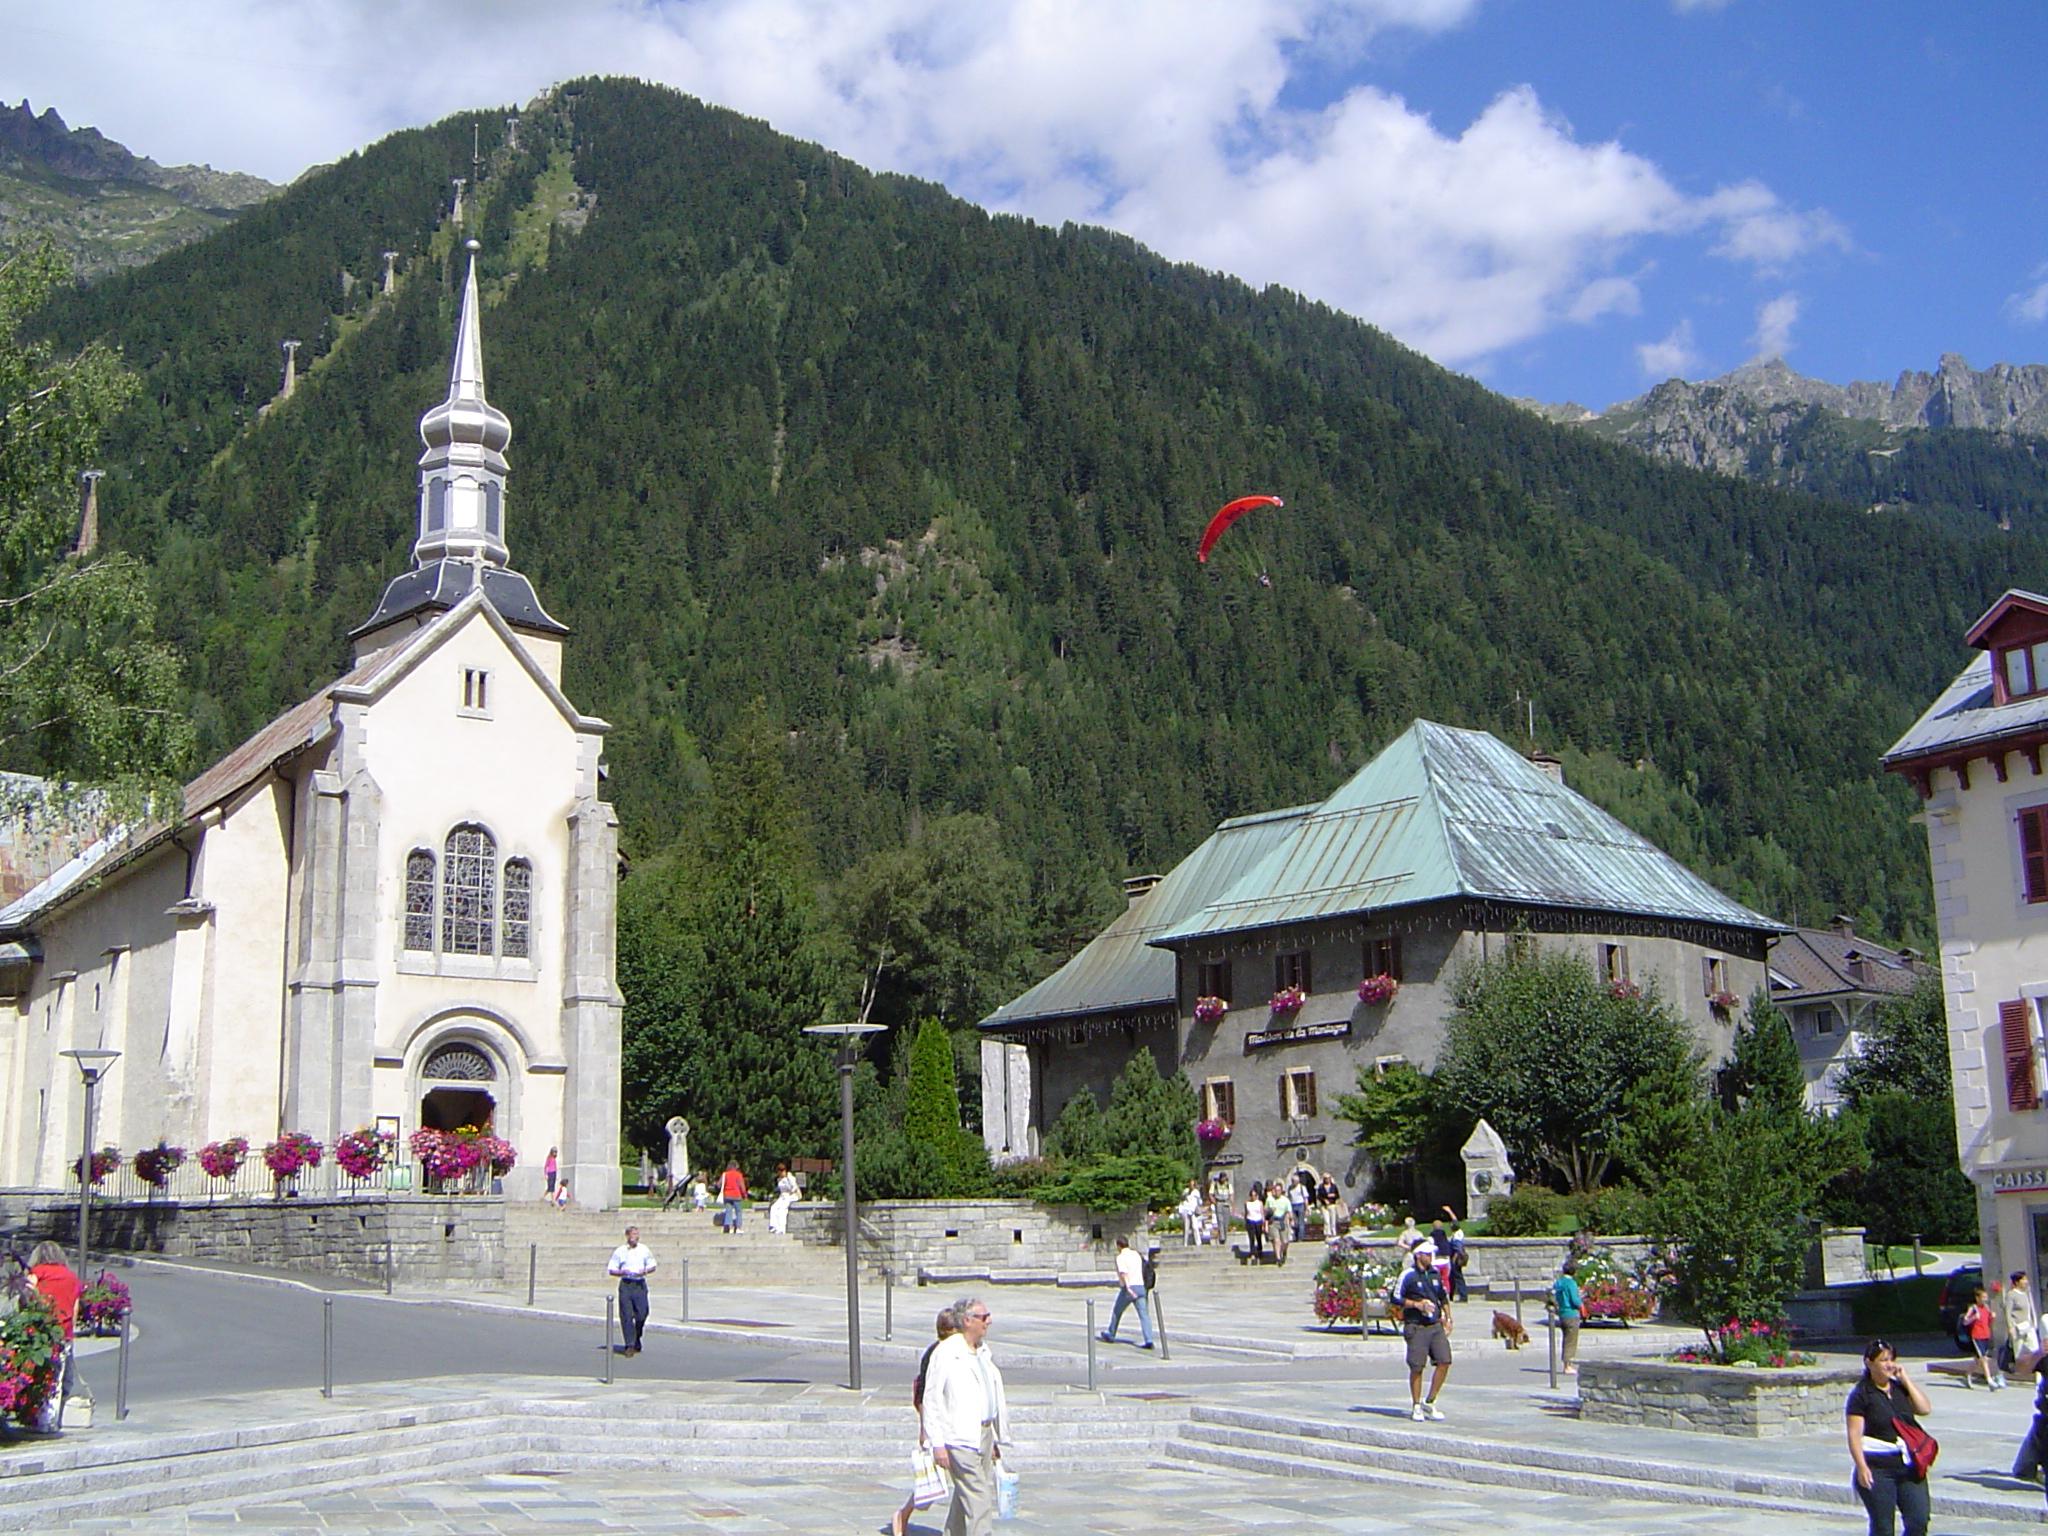 Meteo montagne chamonix mont blanc wroc awski informator - Chamonix mont blanc office du tourisme ...